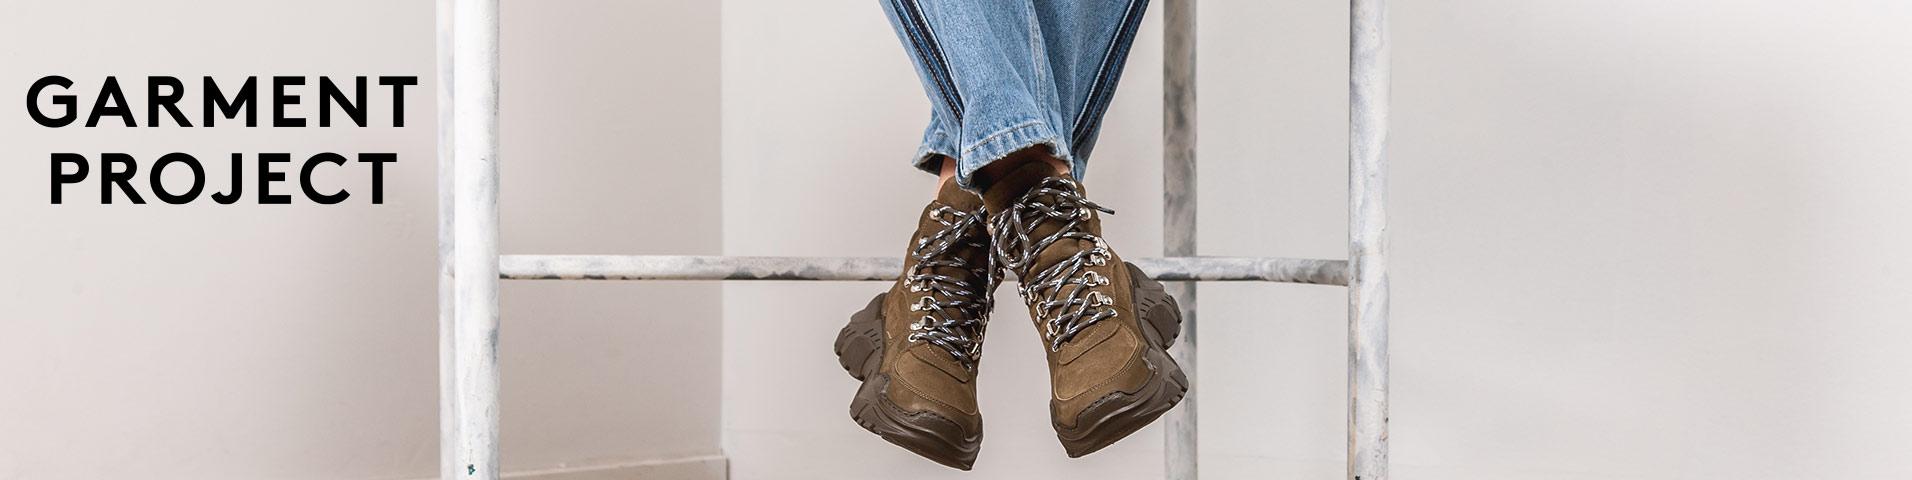 GARMENT PROJECT Sneakers | Damer | Køb dine nye sneakers